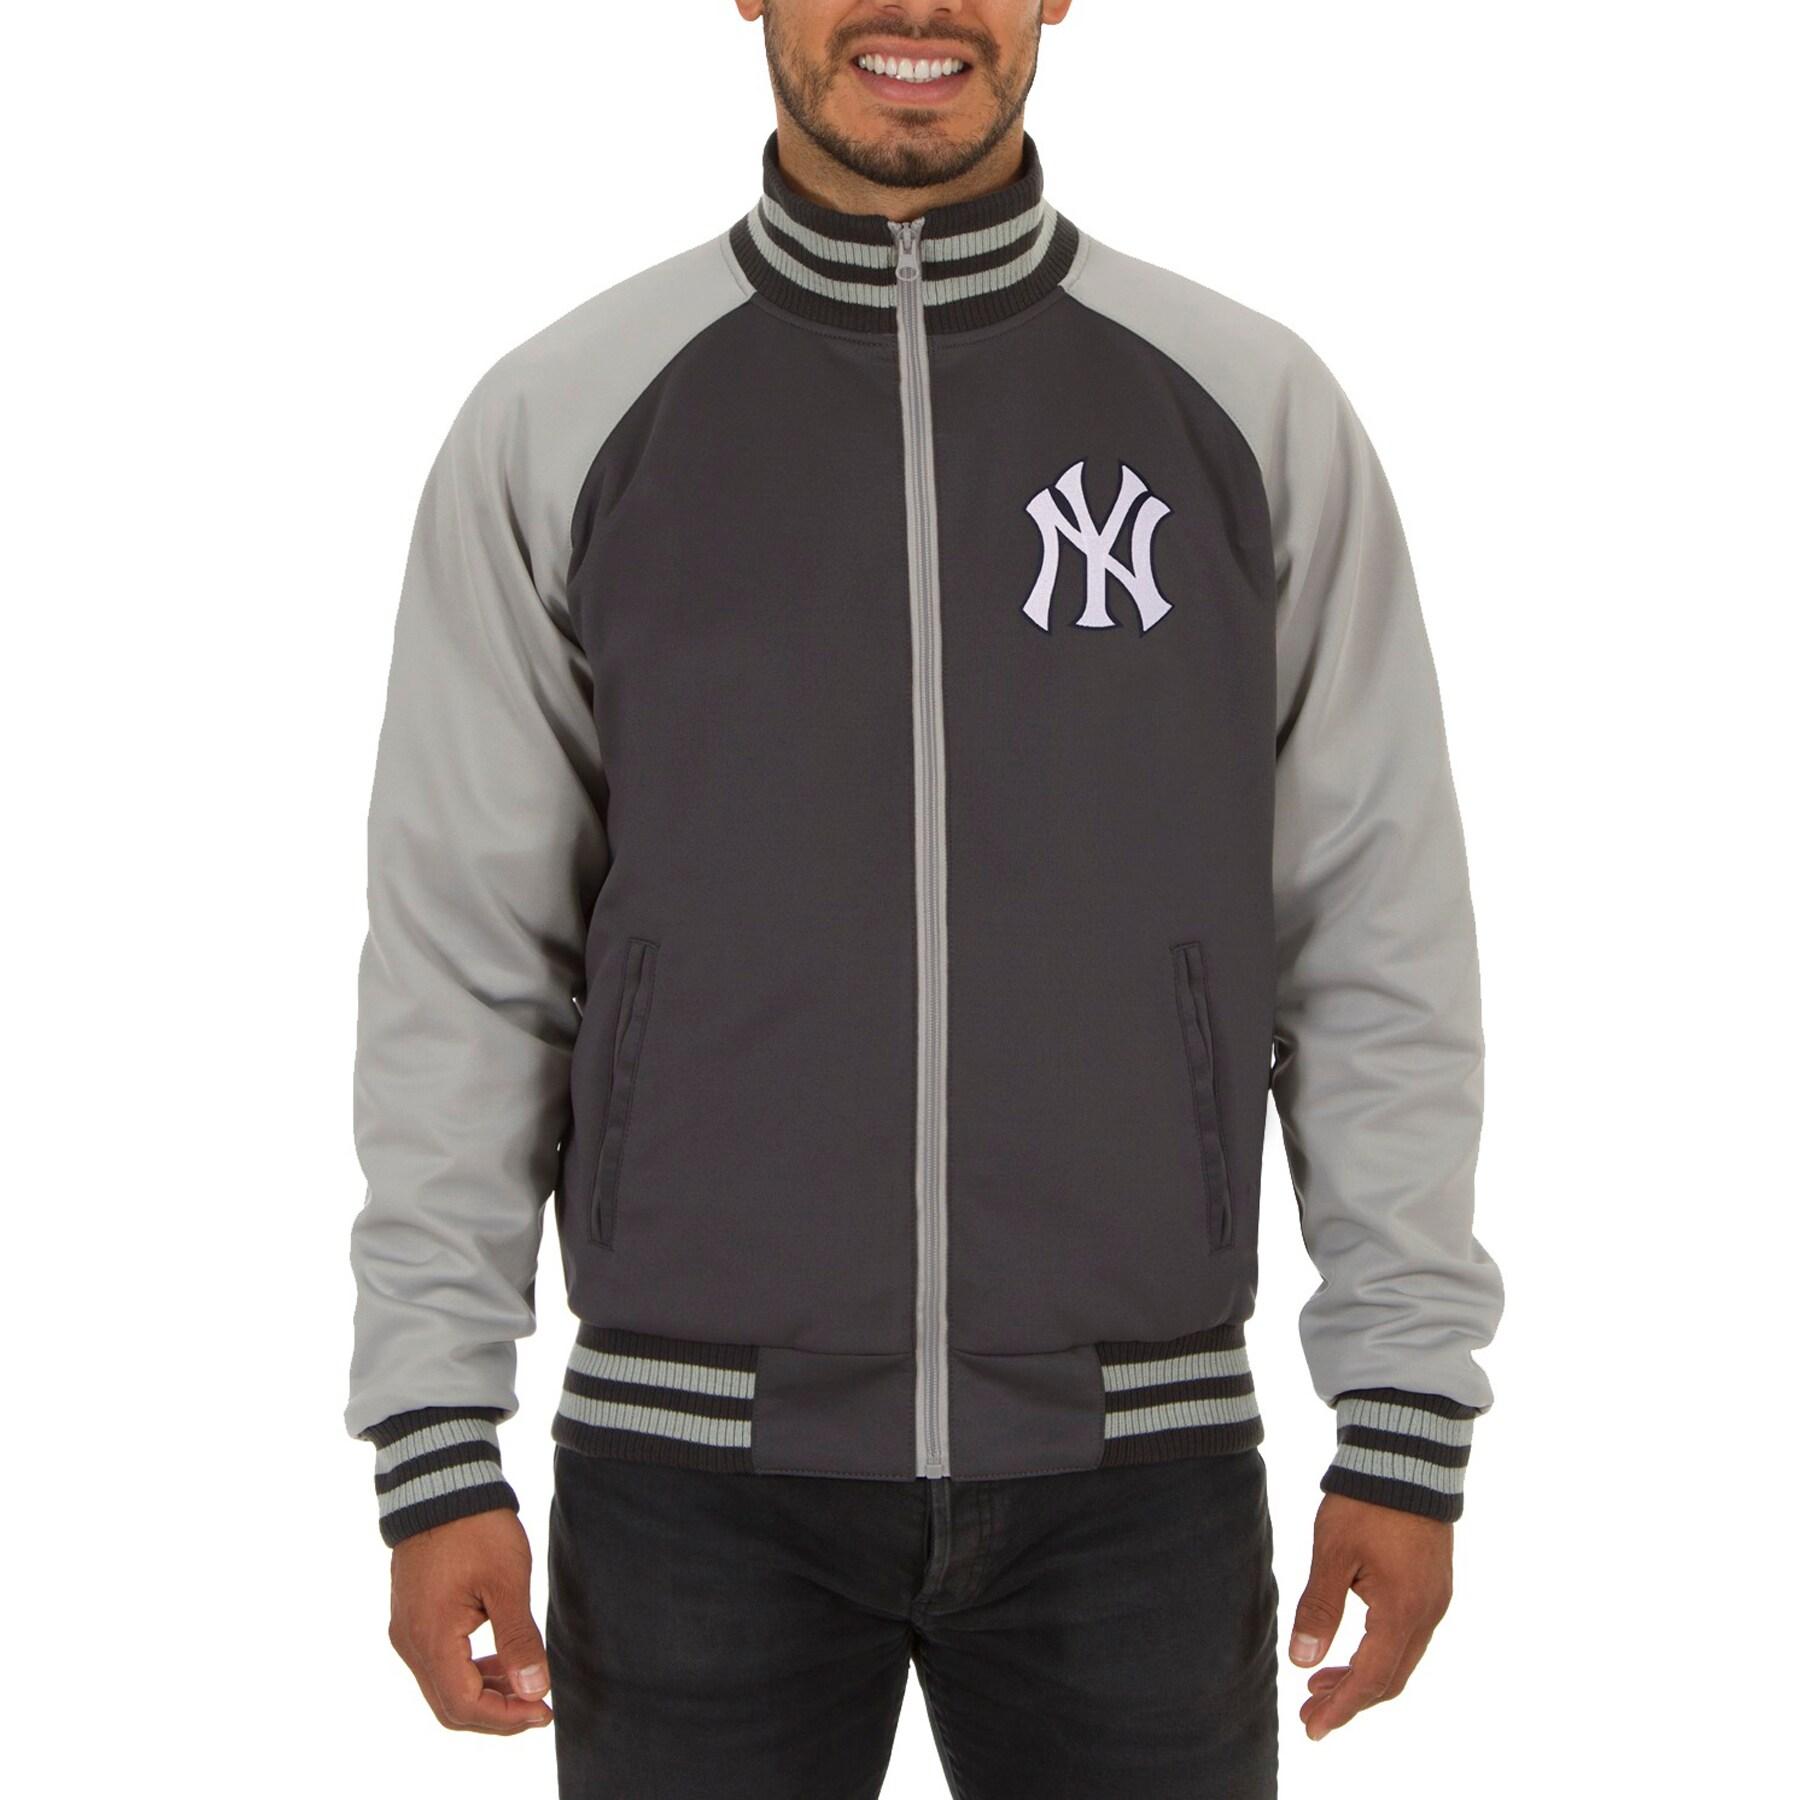 New York Yankees JH Design Reversible Track Jacket - Gray